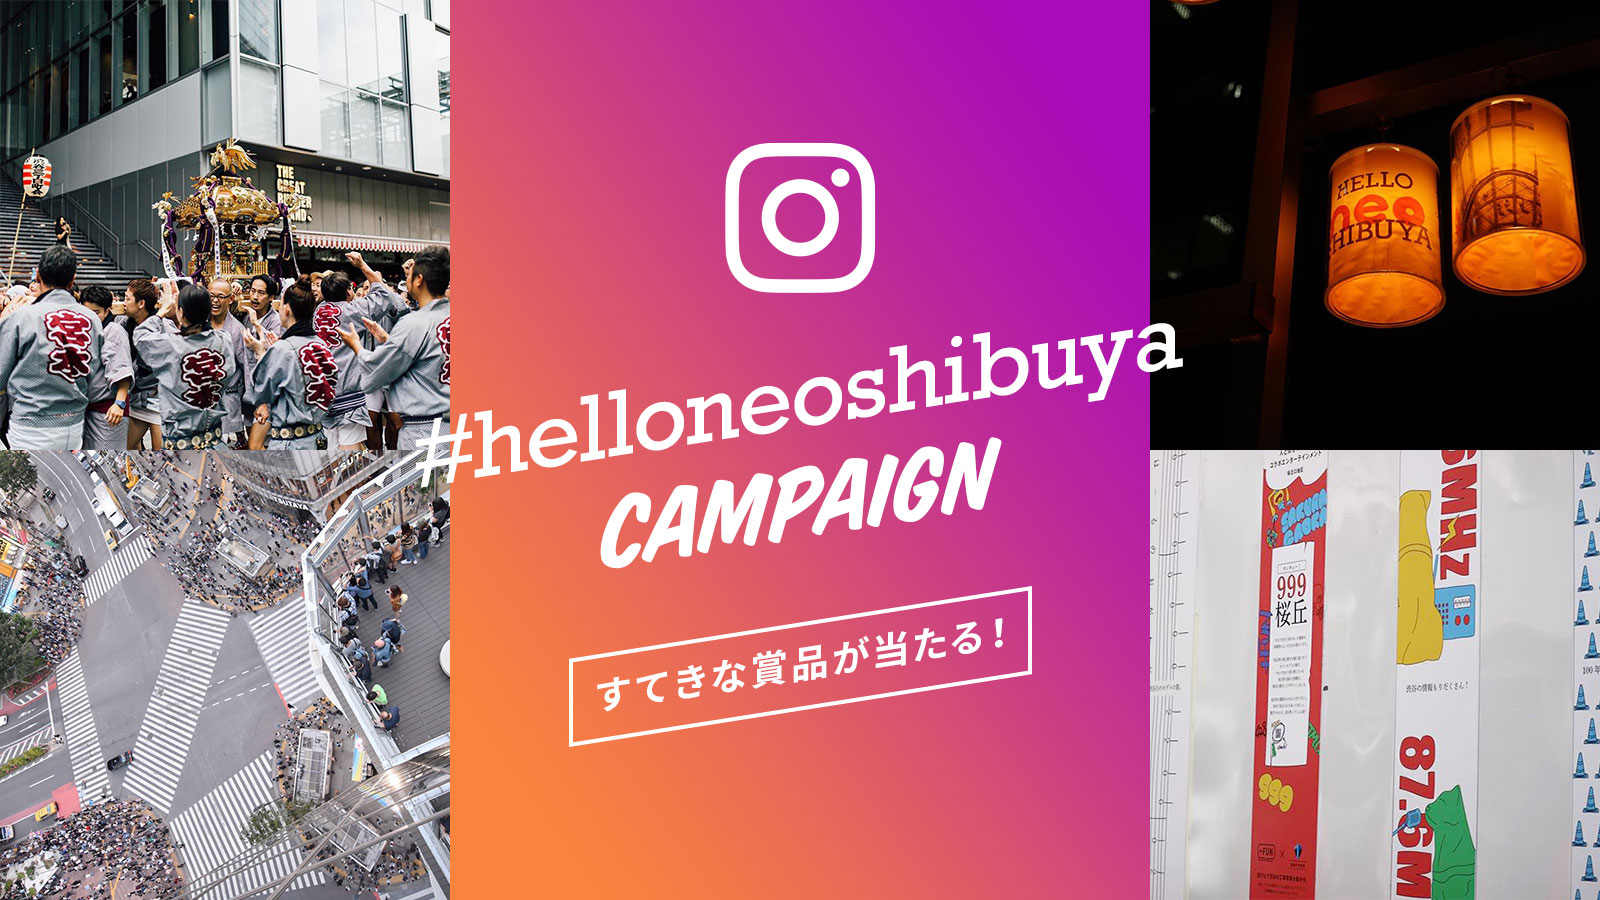 #helloneoshibuyaキャンペーン